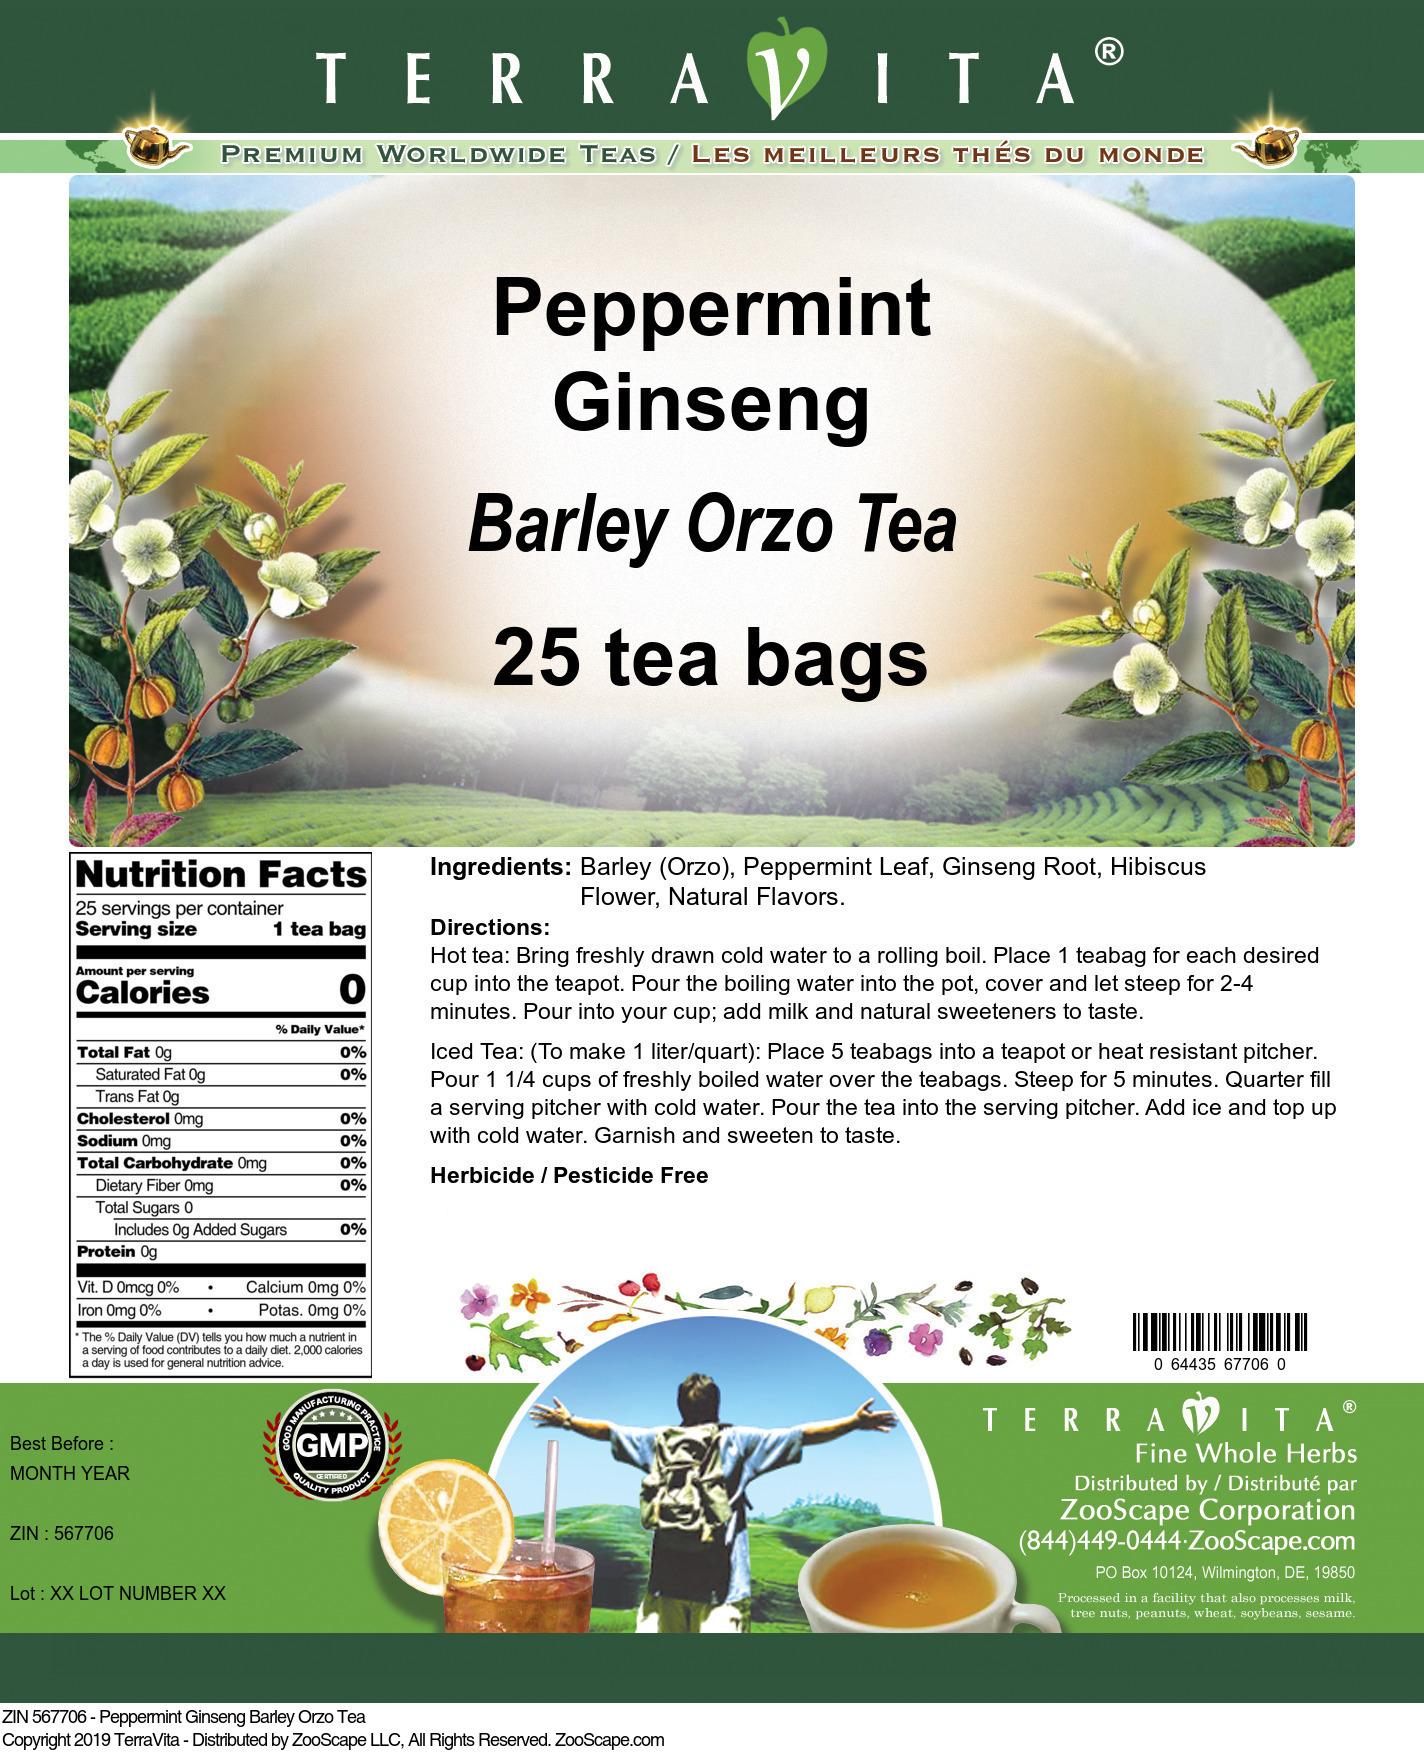 Peppermint Ginseng Barley Orzo Tea